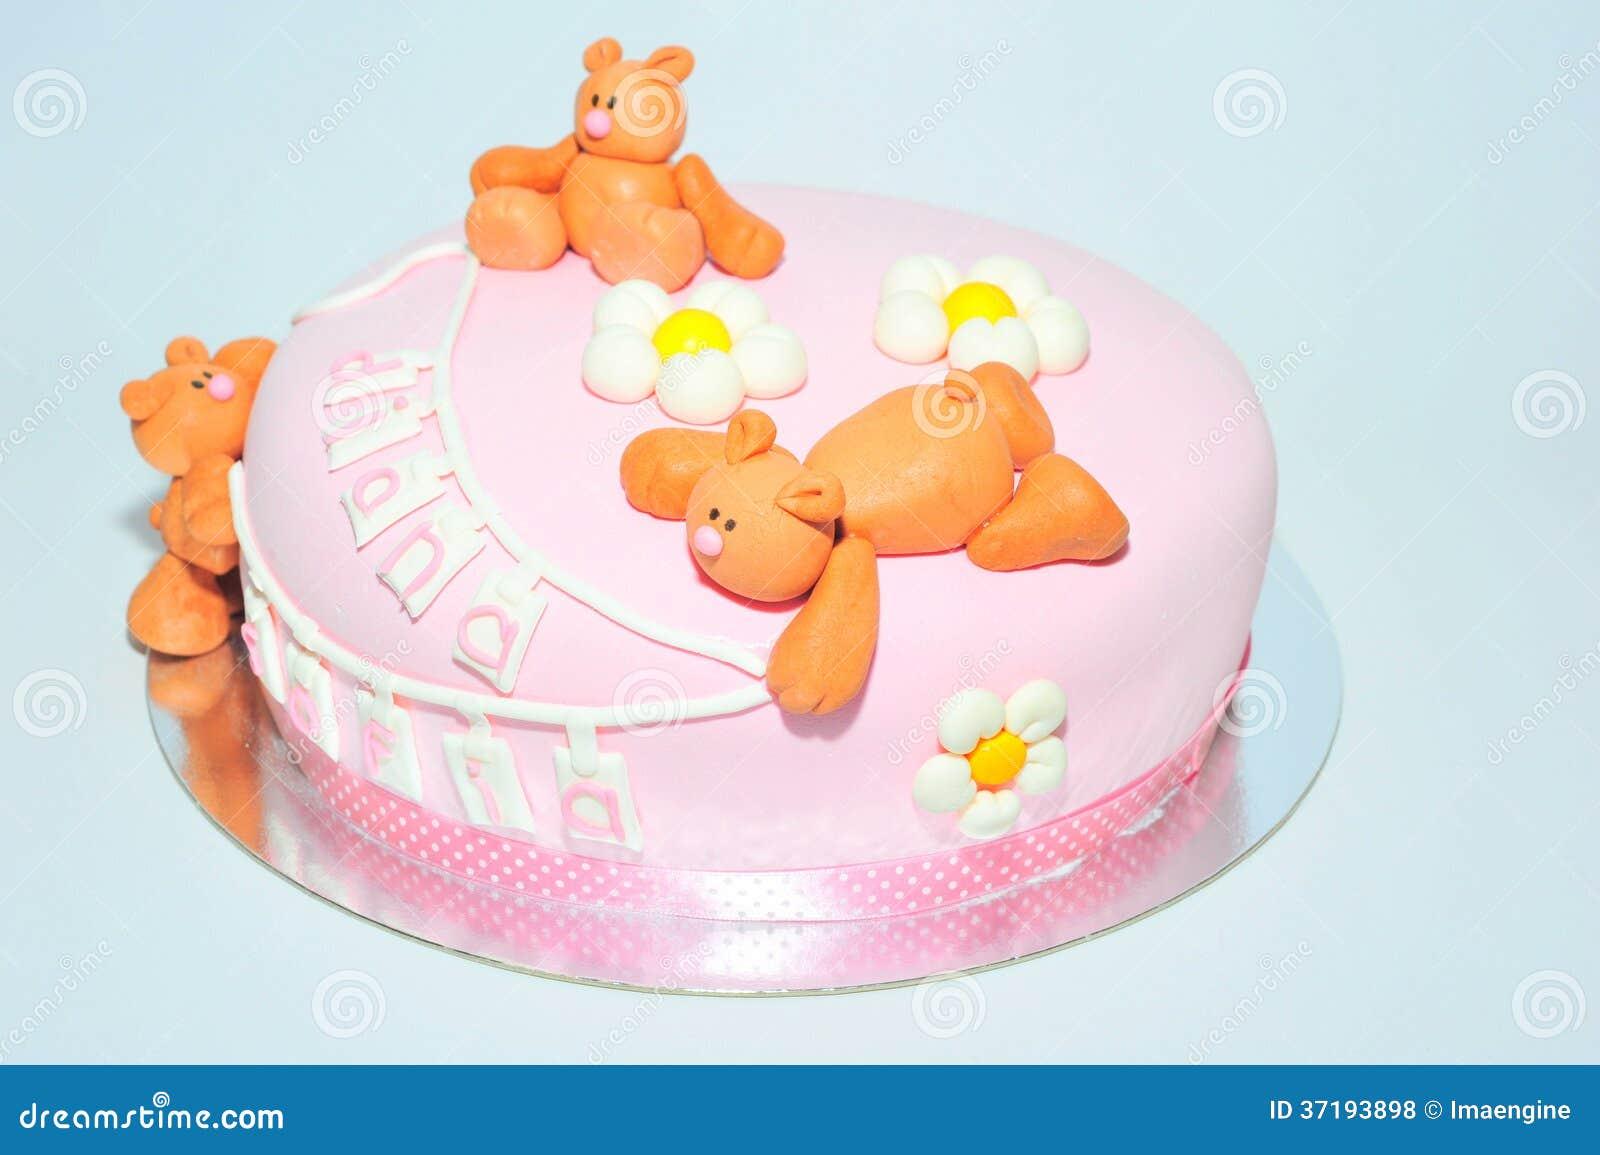 Kids Birthday Cake With Fondant Teddy Bears Stock Photo Image Of